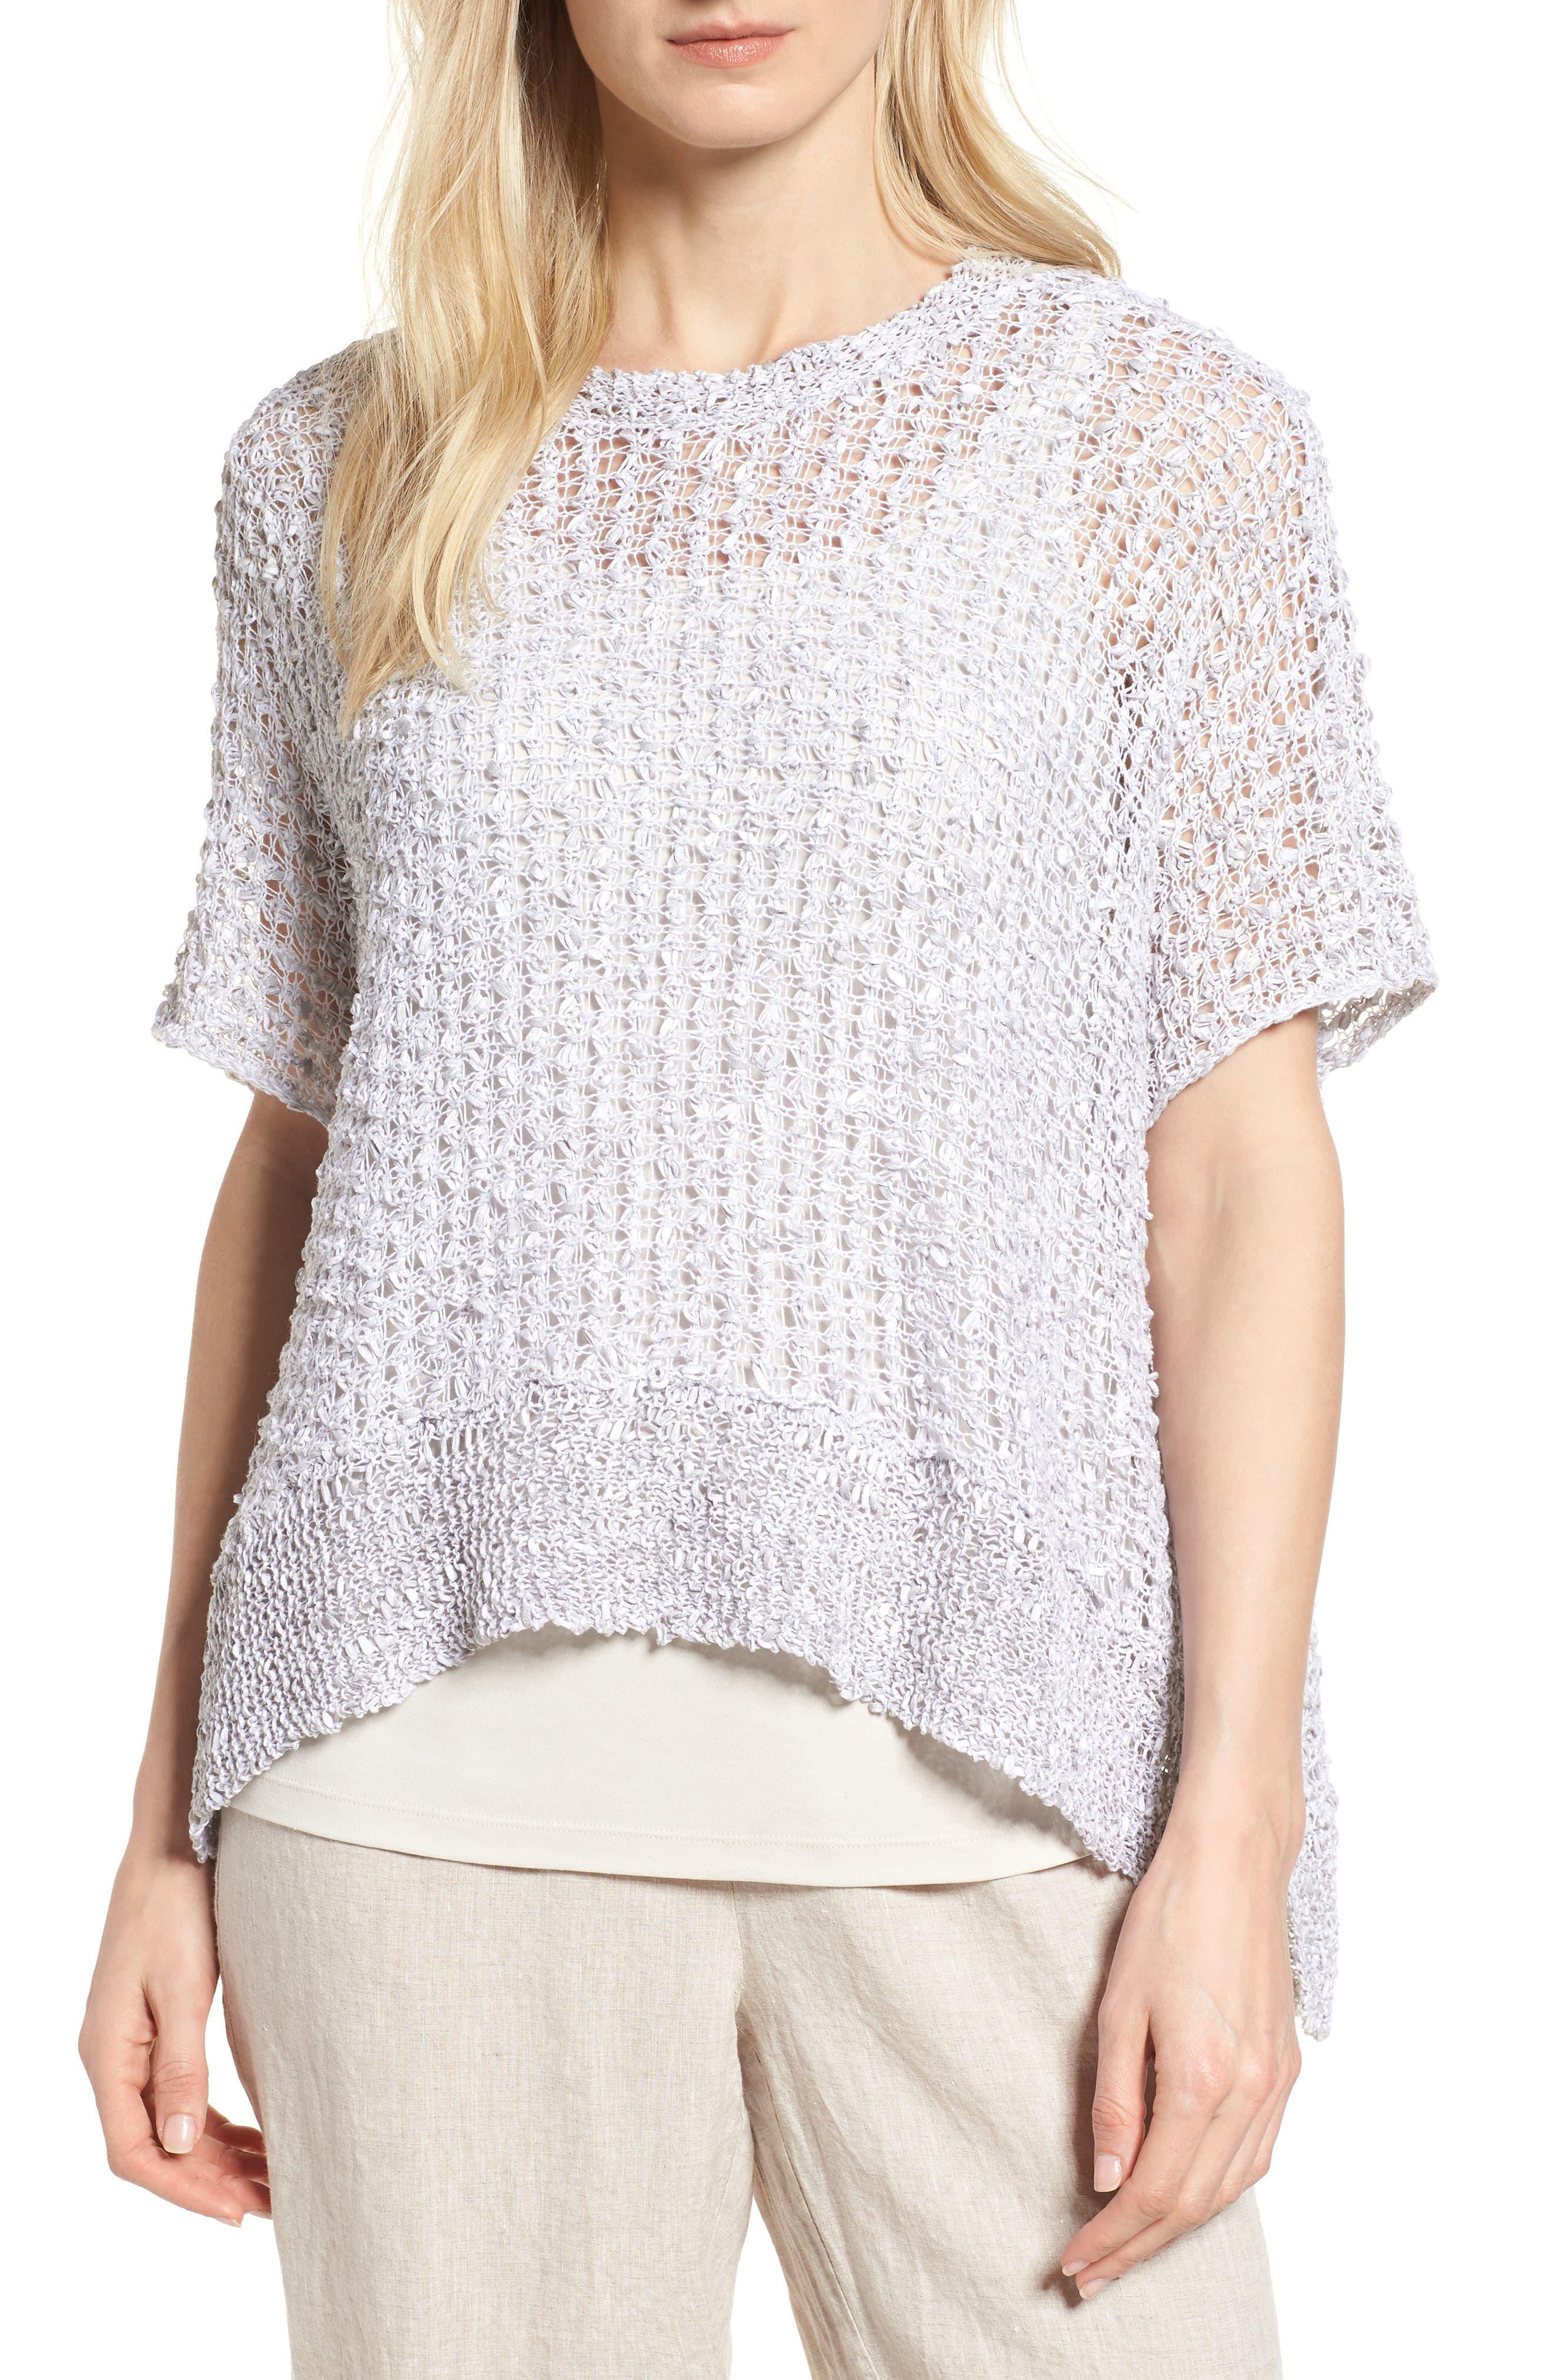 Organic Cotton & Linen Crochet Top,                             Main thumbnail 1, color,                             022